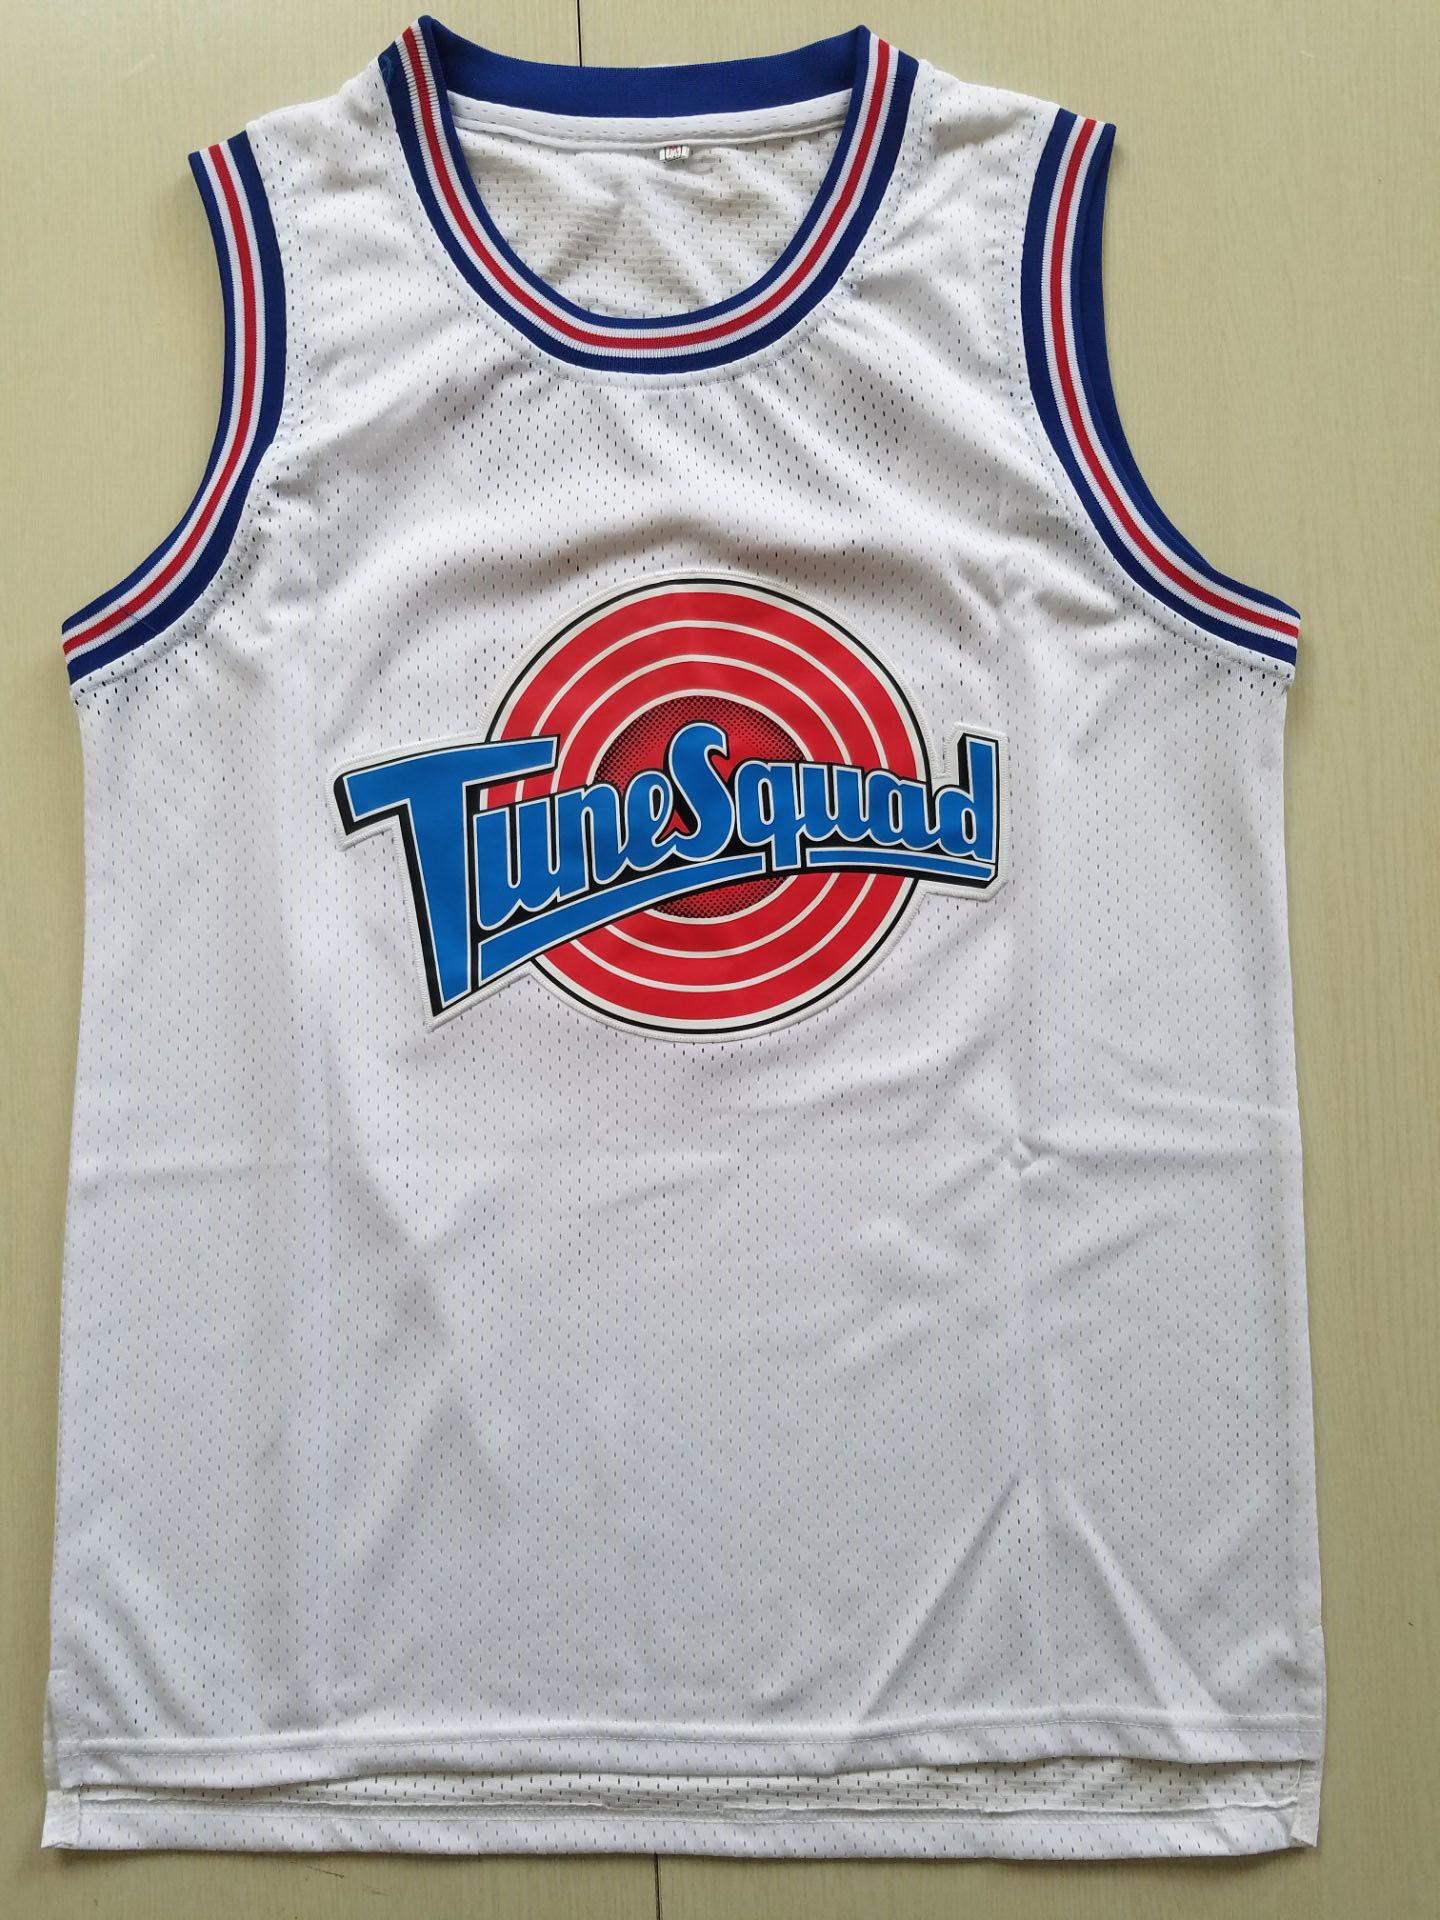 Bill Murray 22 Space Jam Jersey Shirt Squad  looney Tune  Movie Basketball